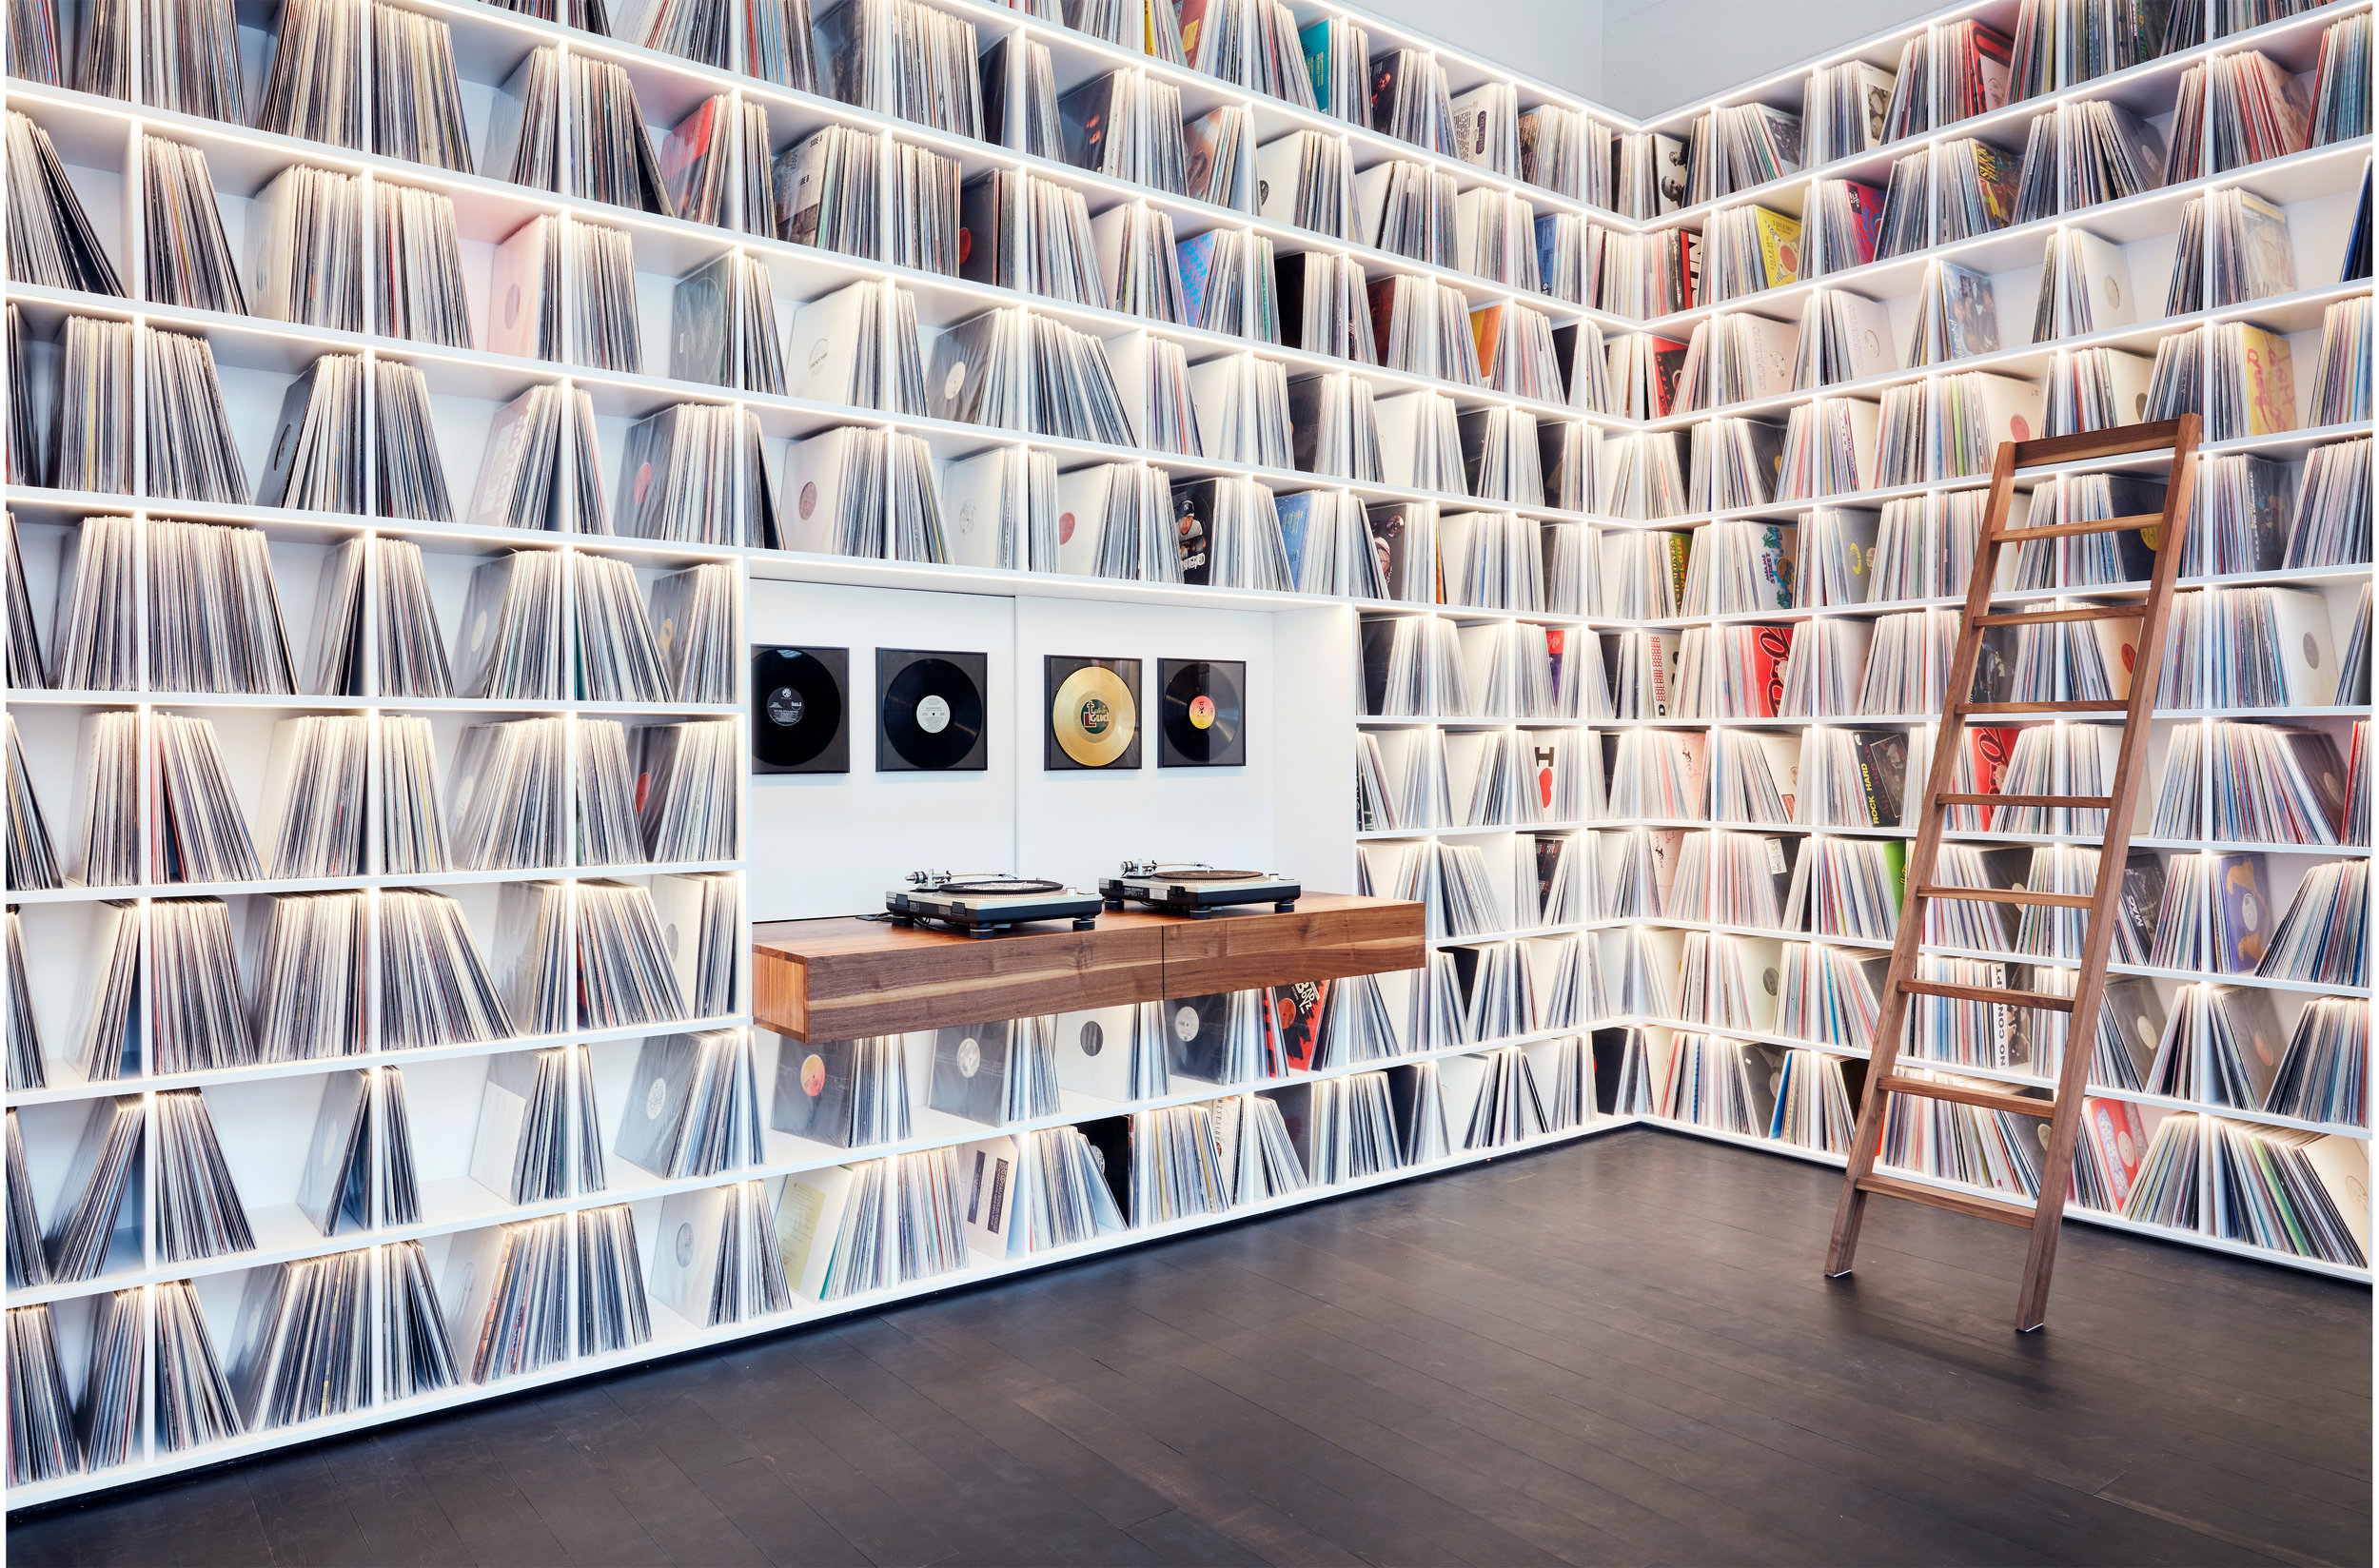 1_Record room_Loft Horgen_Mia Kepenek_foto ©Simone Vogel_4714.jpg